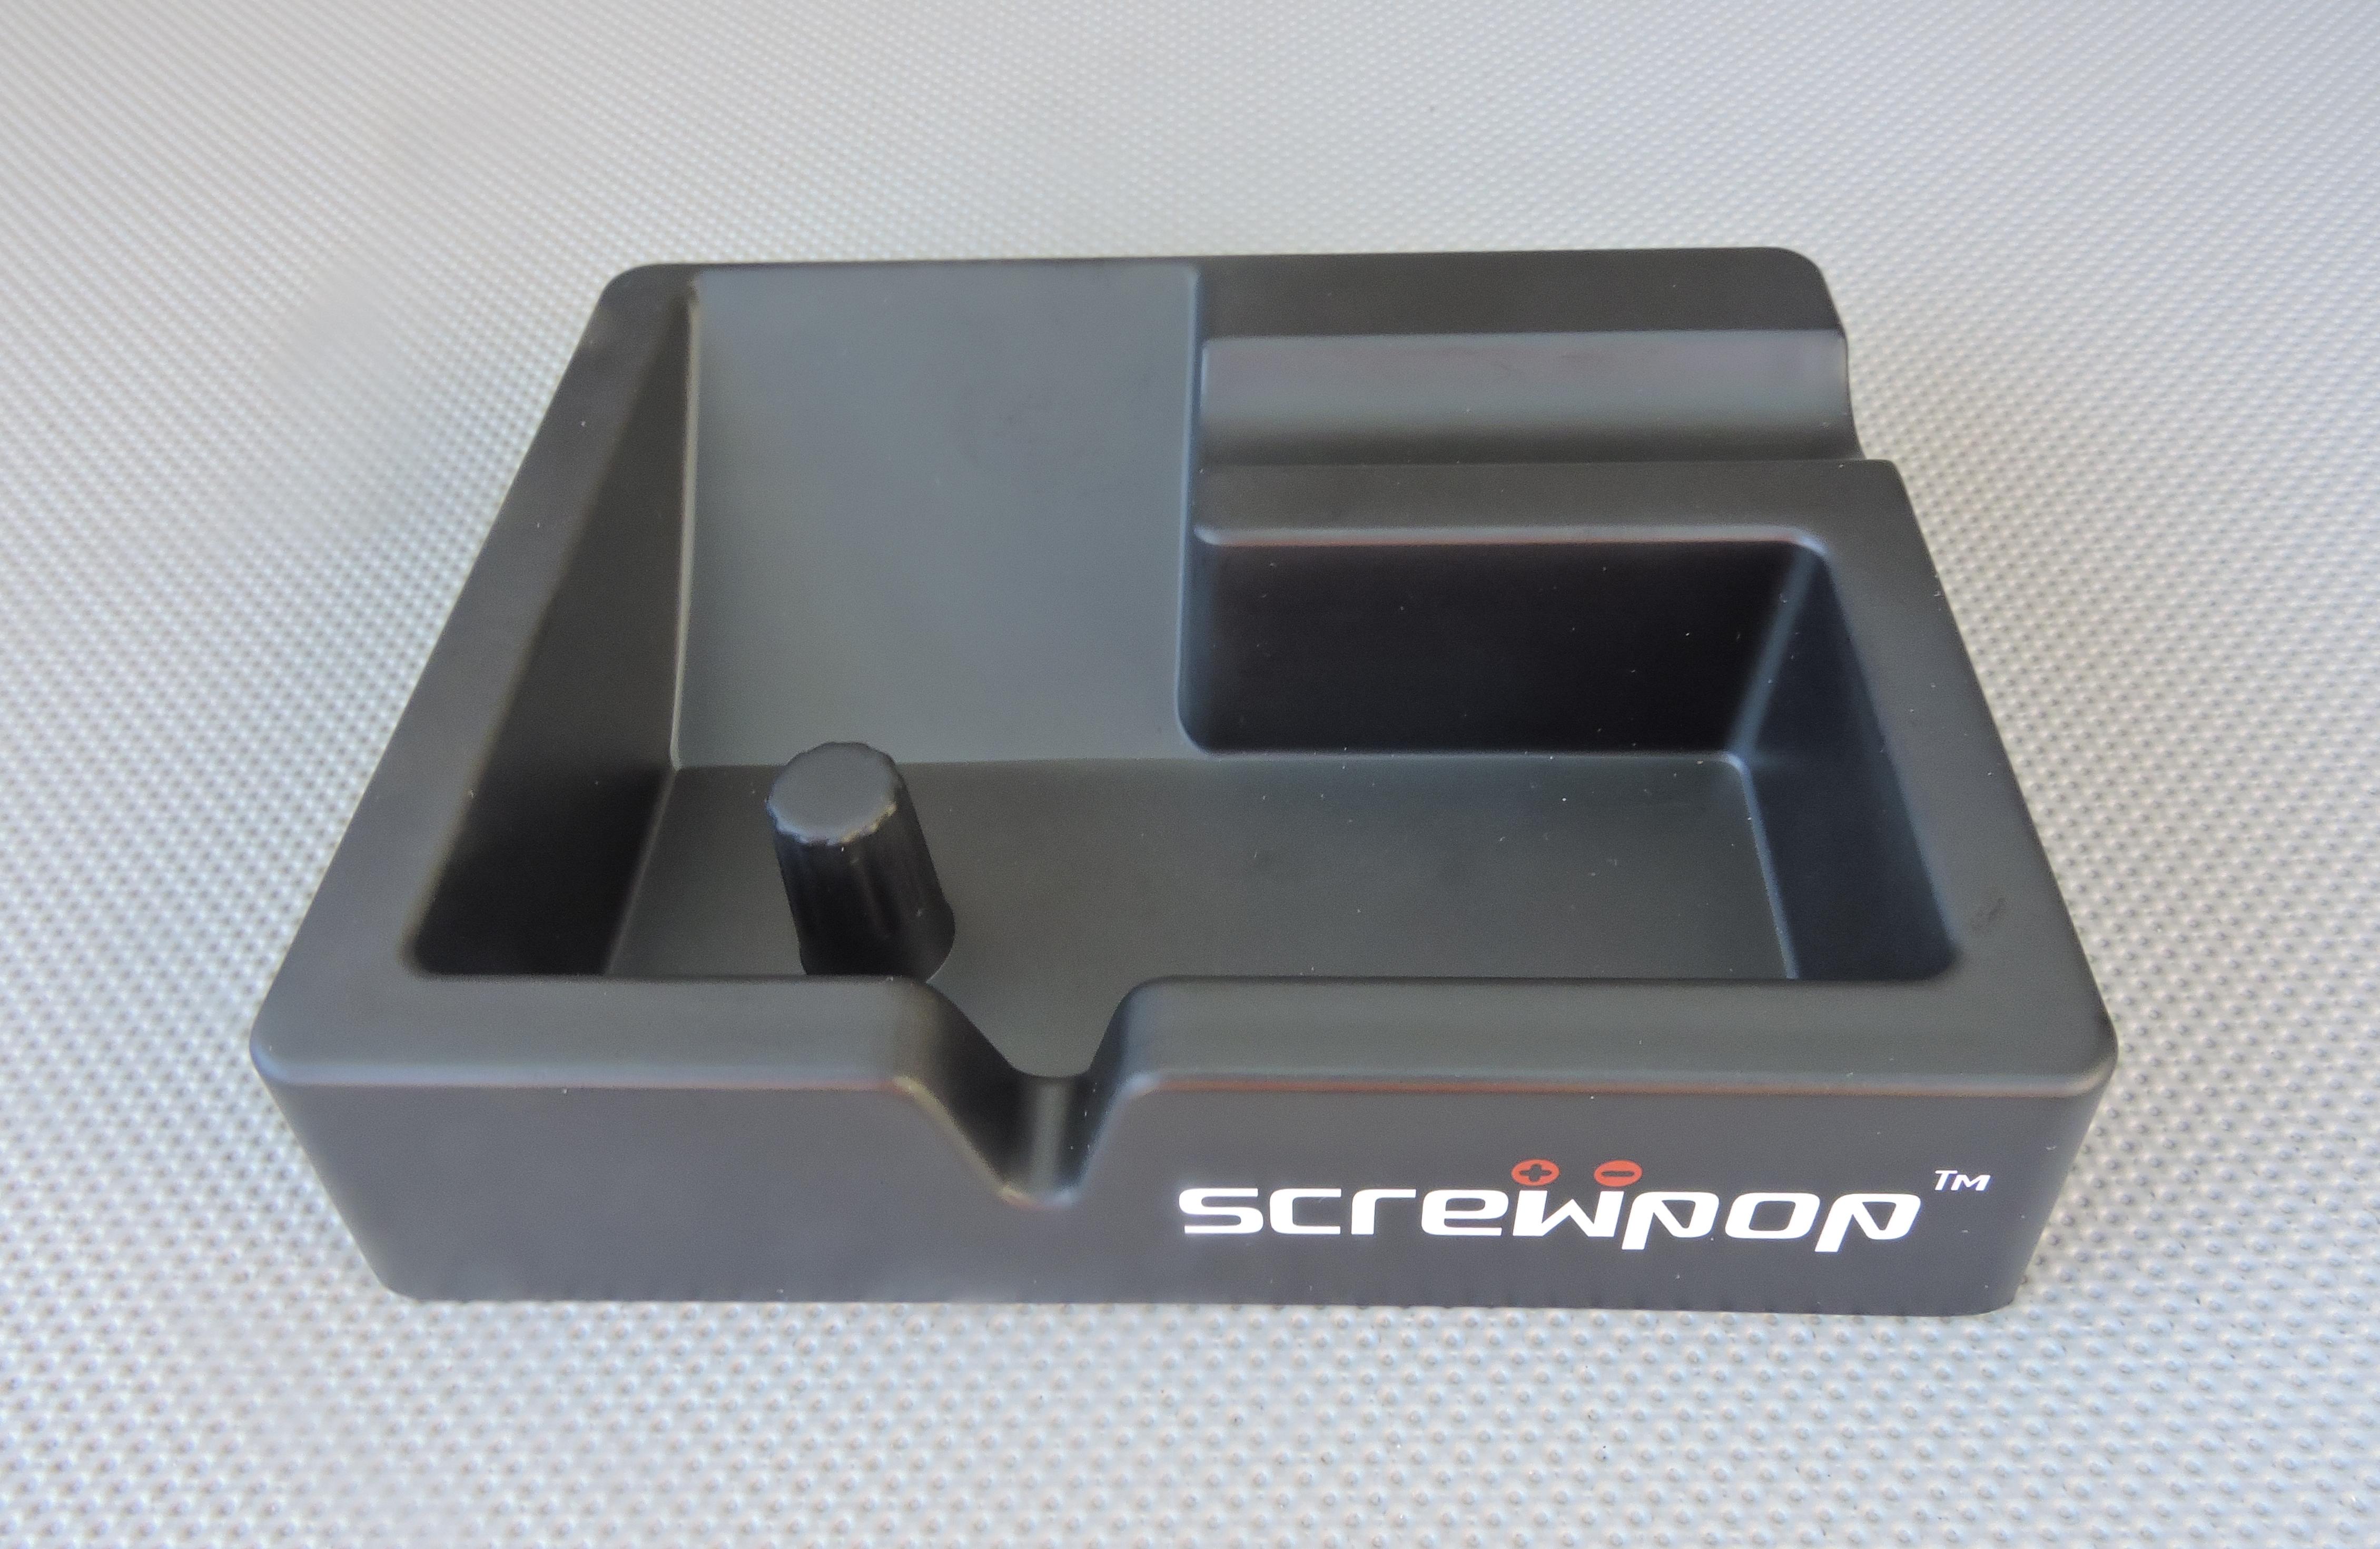 Accessory Review: Screwpop Ashtray